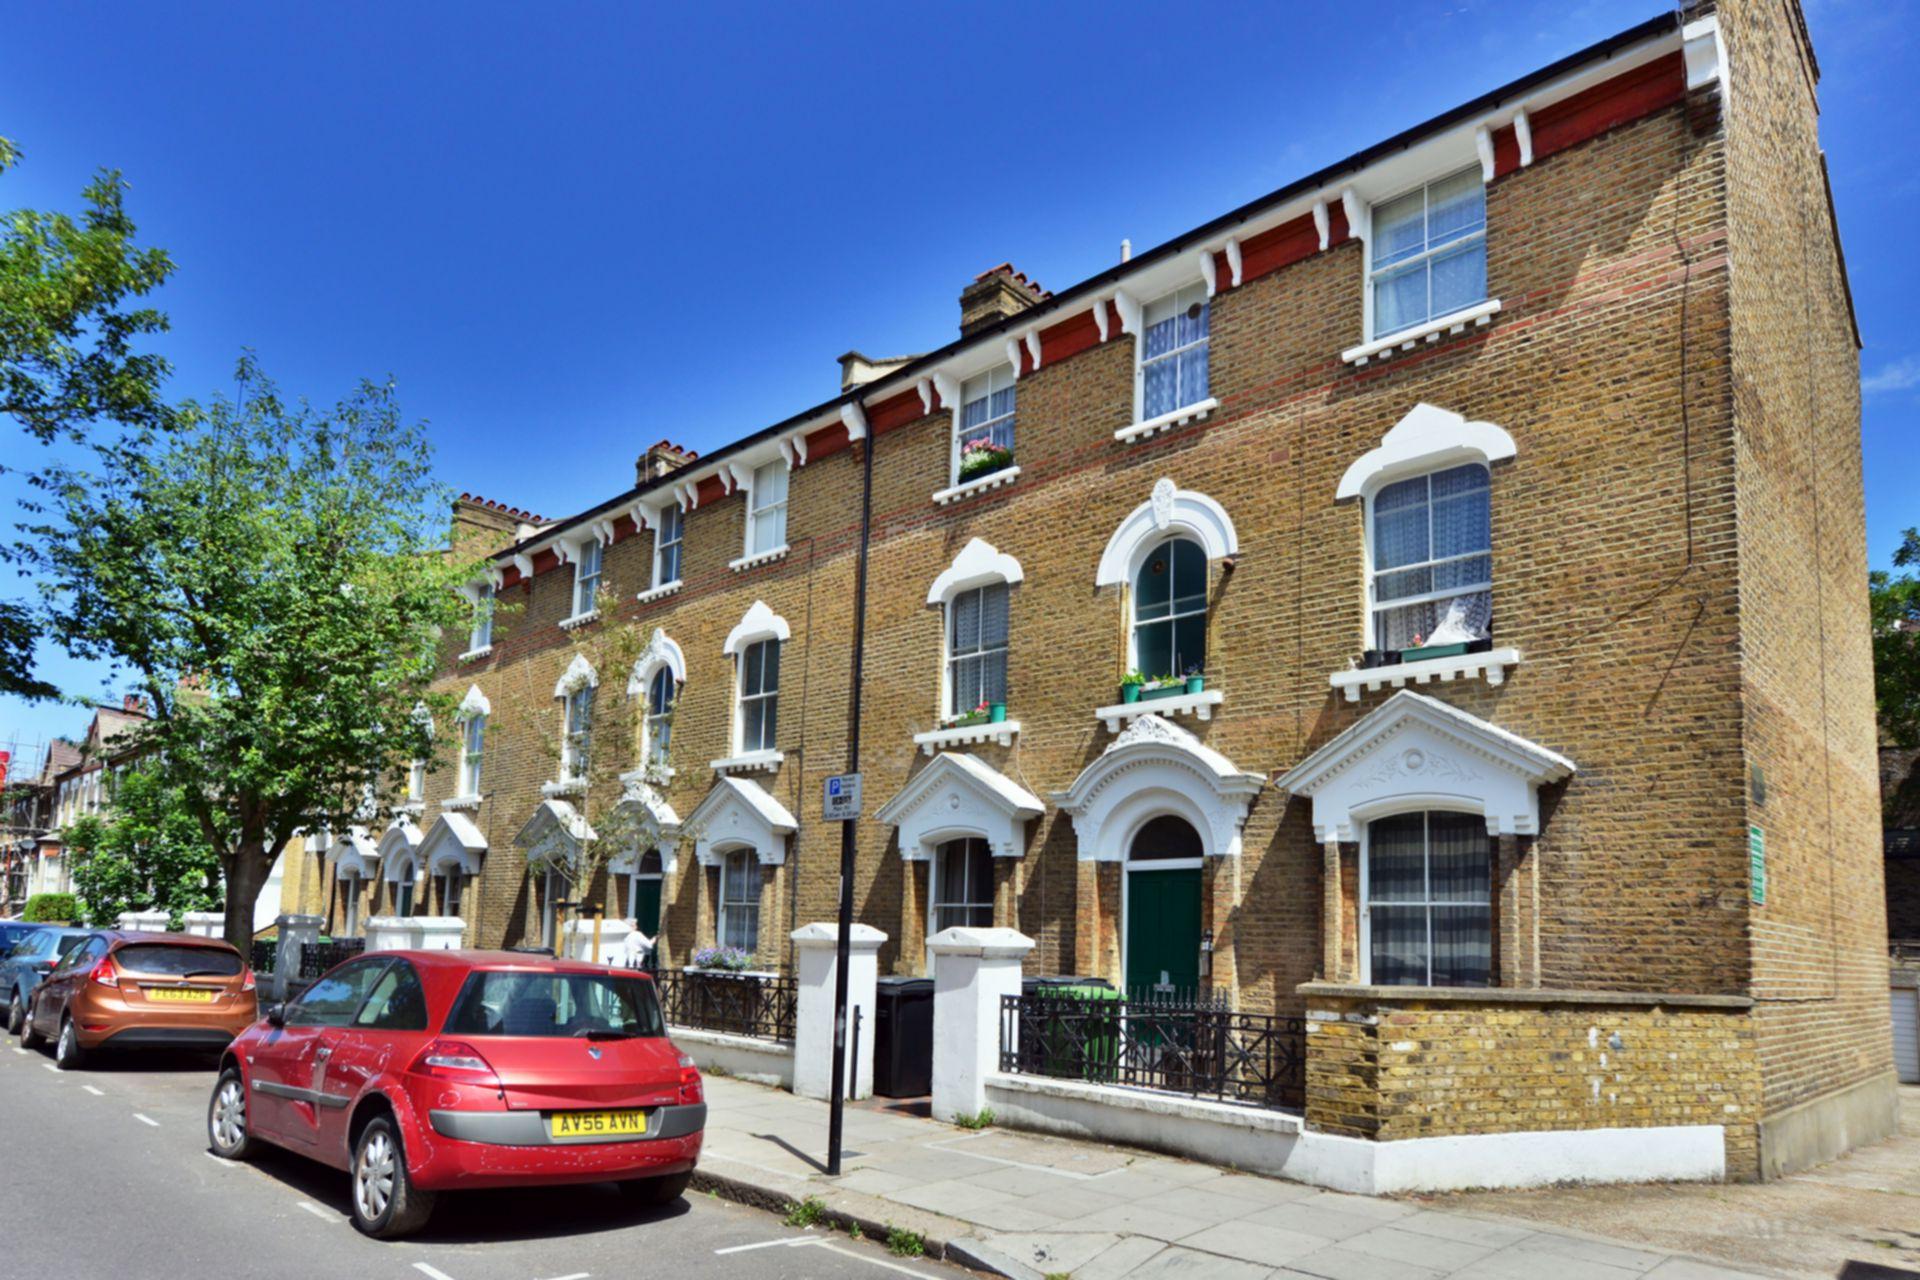 Kingsgate Road  West Hampstead  NW6